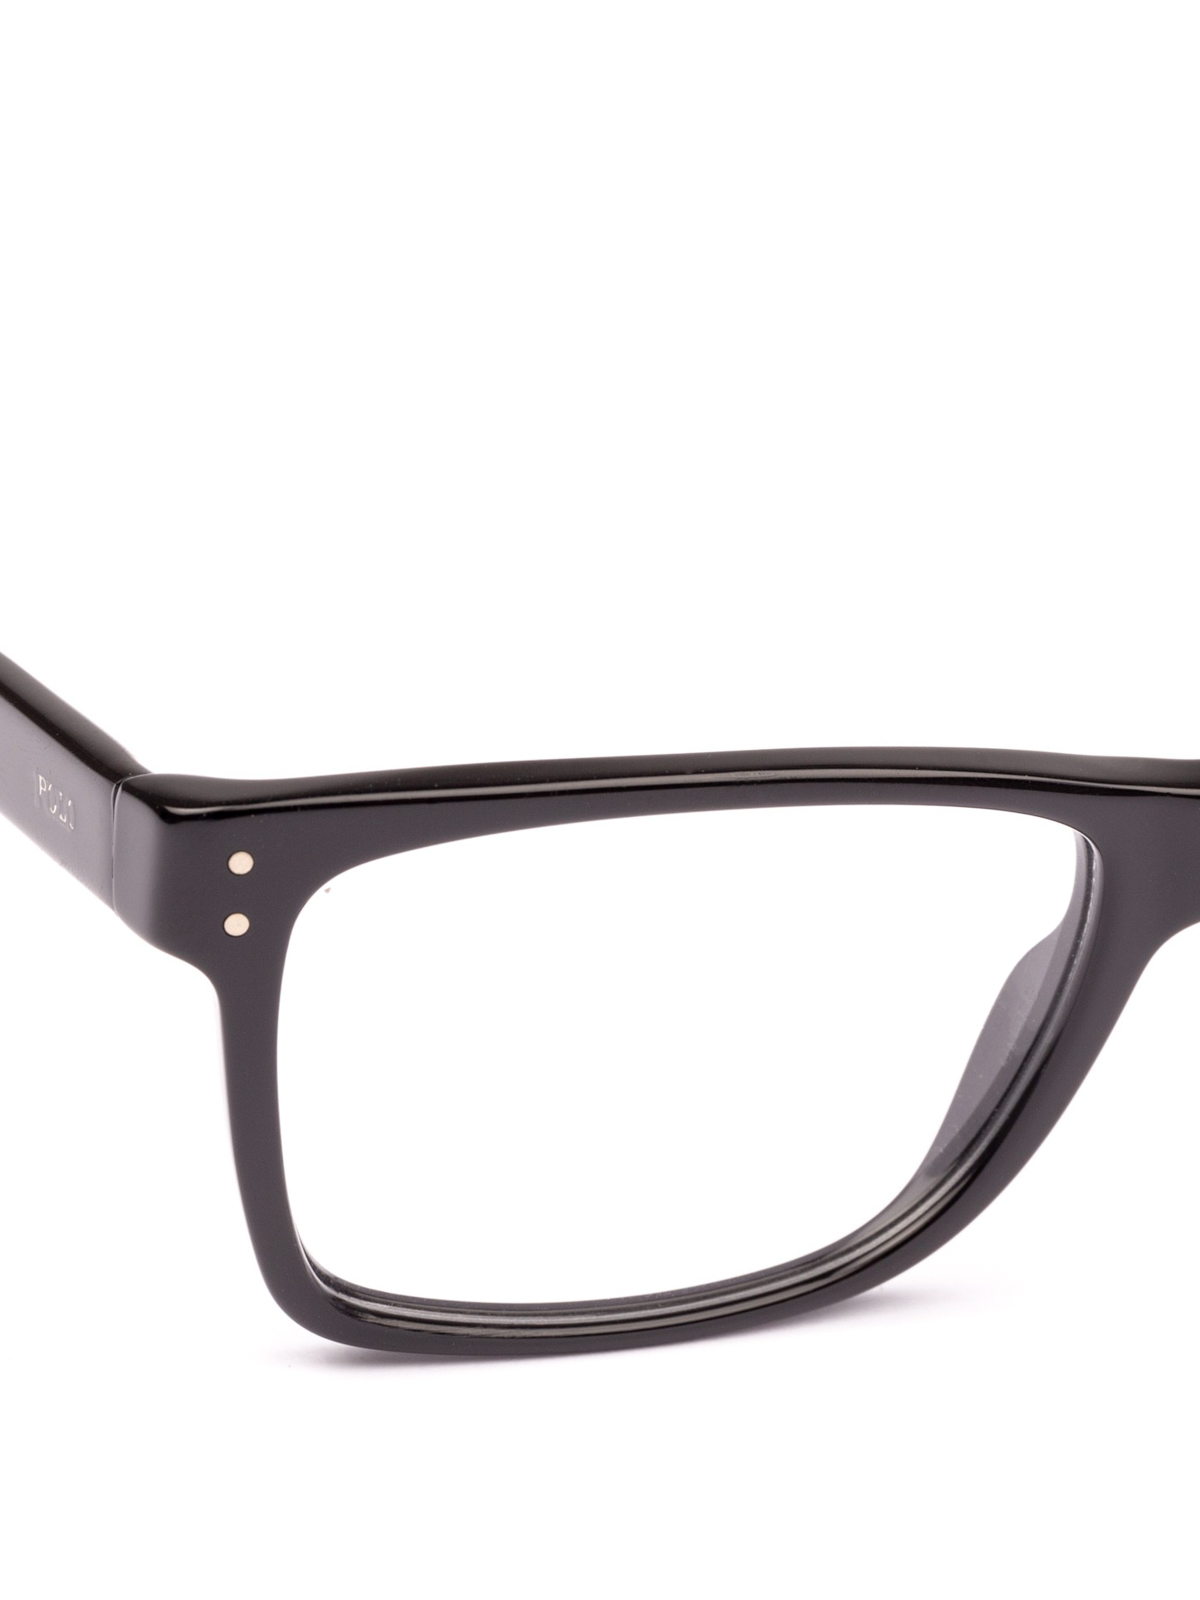 29a636450fcf4 iKRIX POLO RALPH LAUREN  Glasses - Black acetate frame square glasses